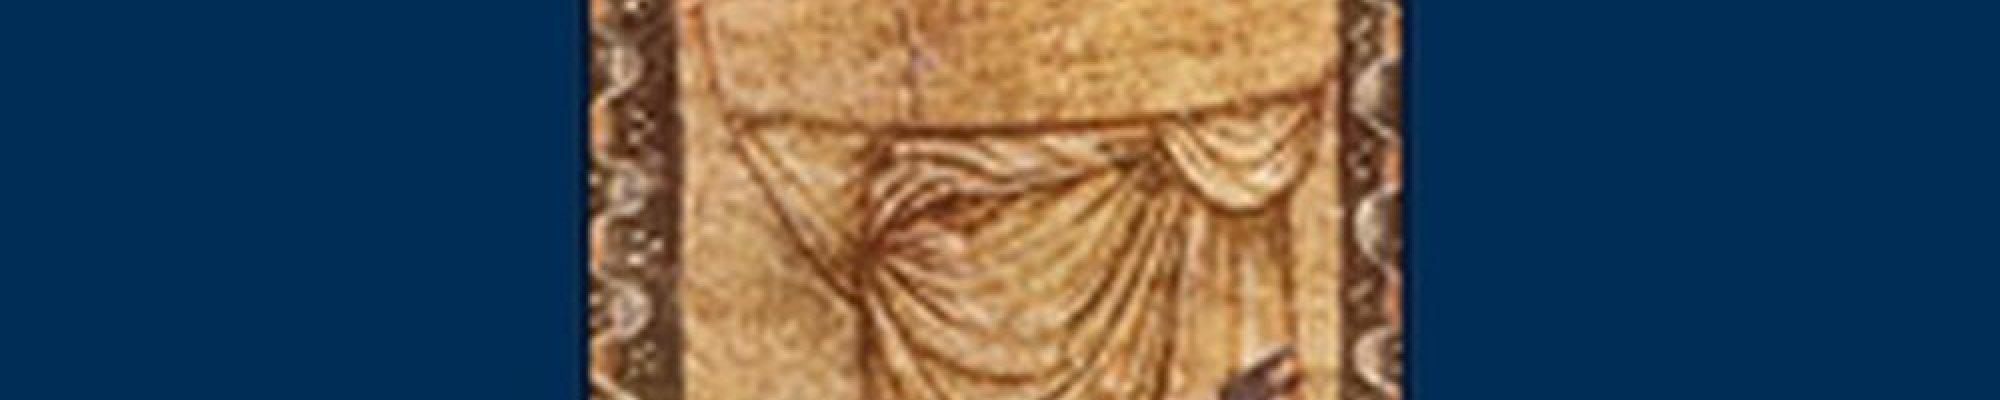 The Studia Philonica Annual XXXII, 2020. Studies in Hellenistic Judaism